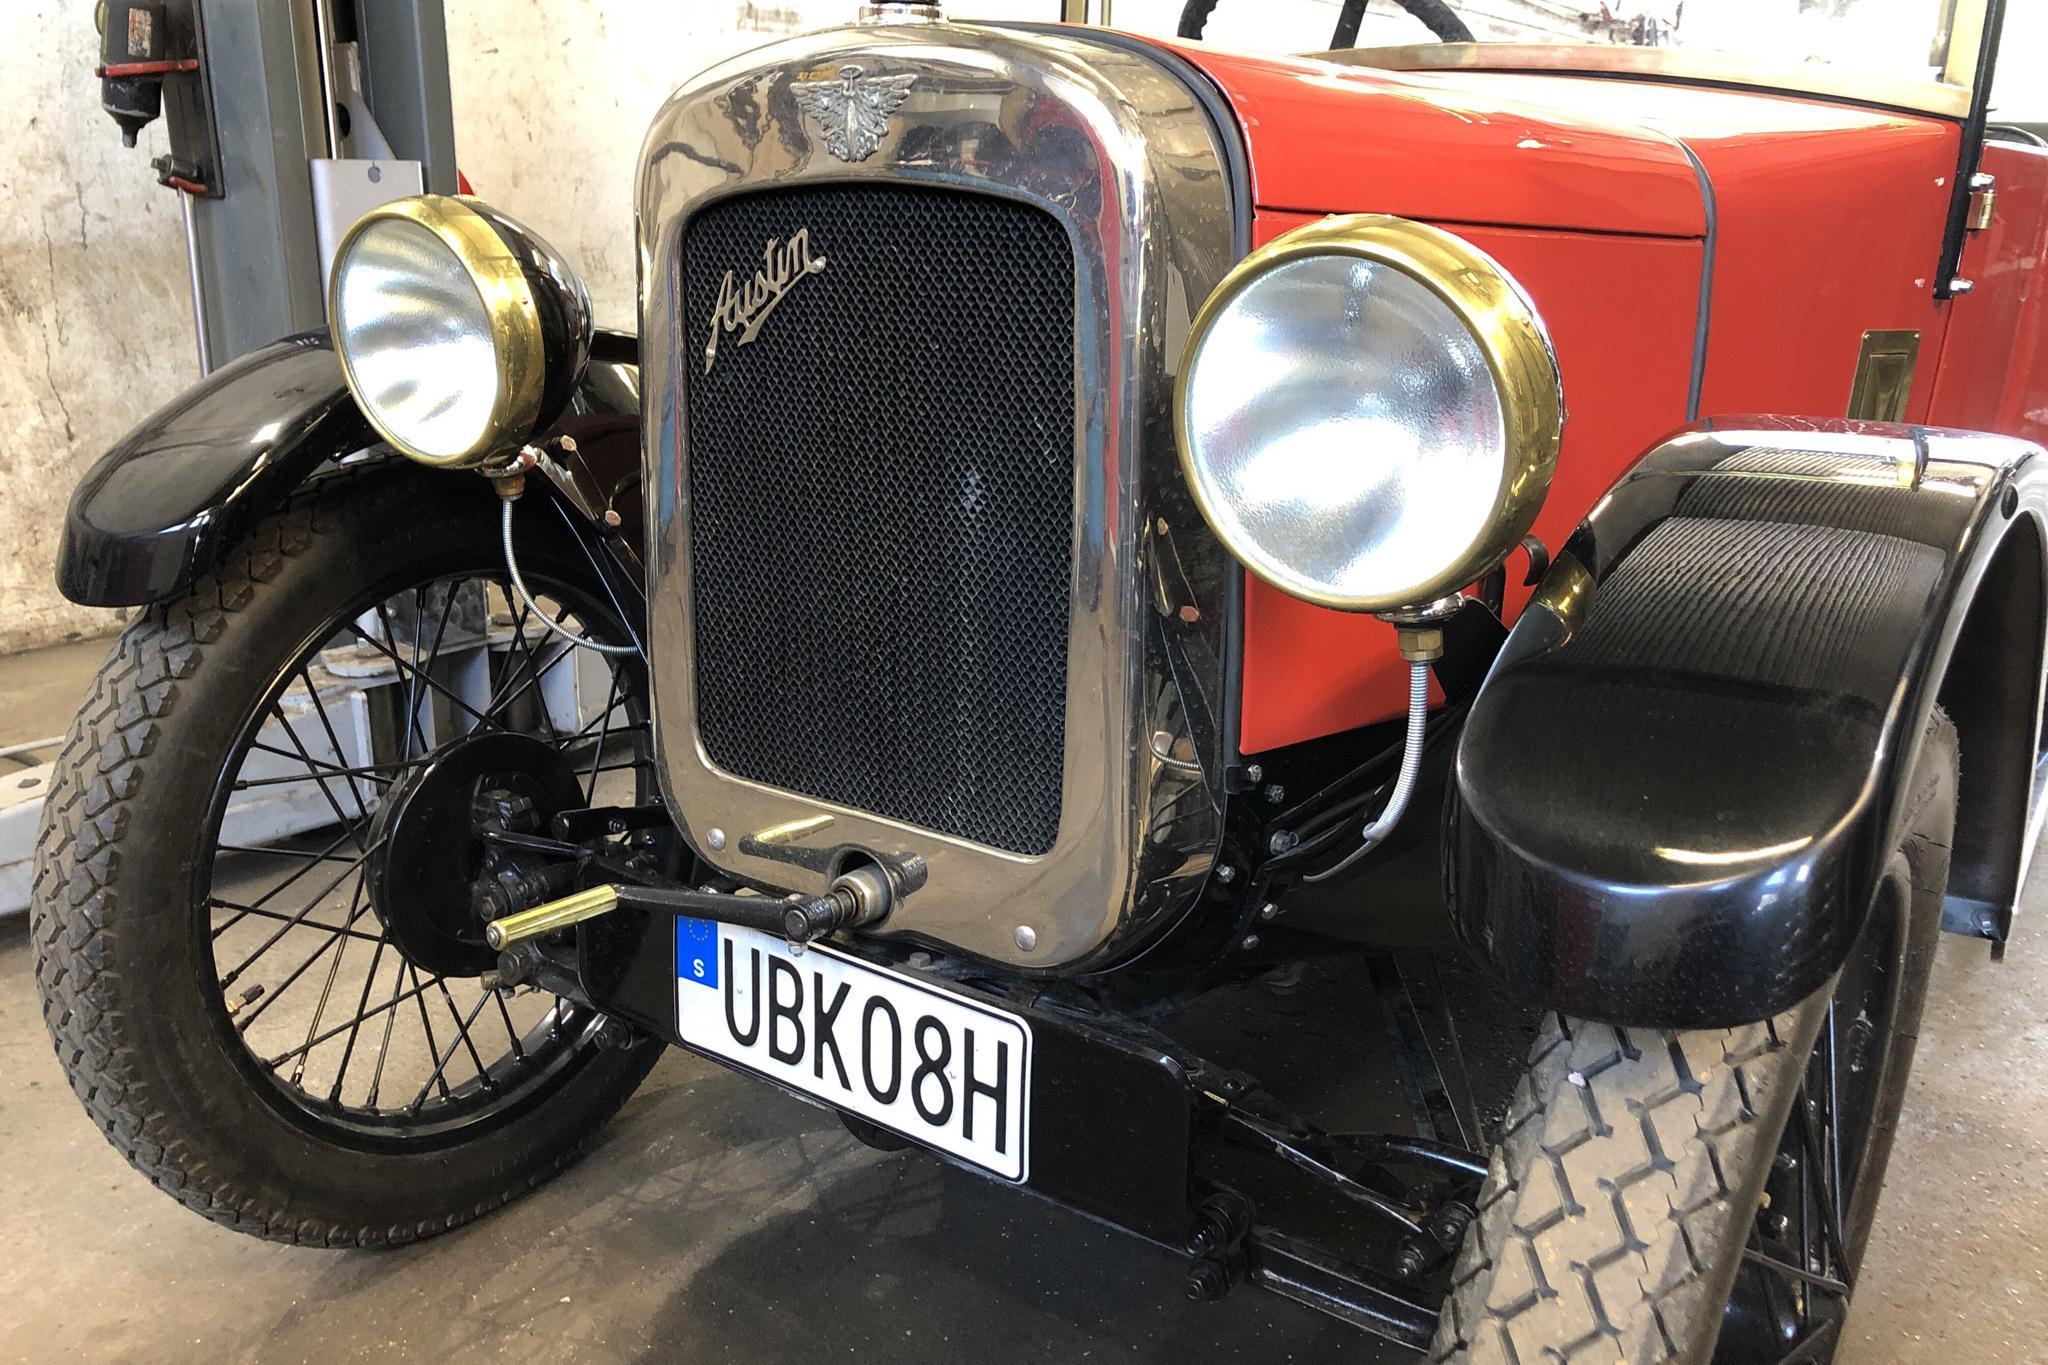 Austin 7 Cabriolet 0.75 (10hk) - 87 170 km - Manual - red - 1929